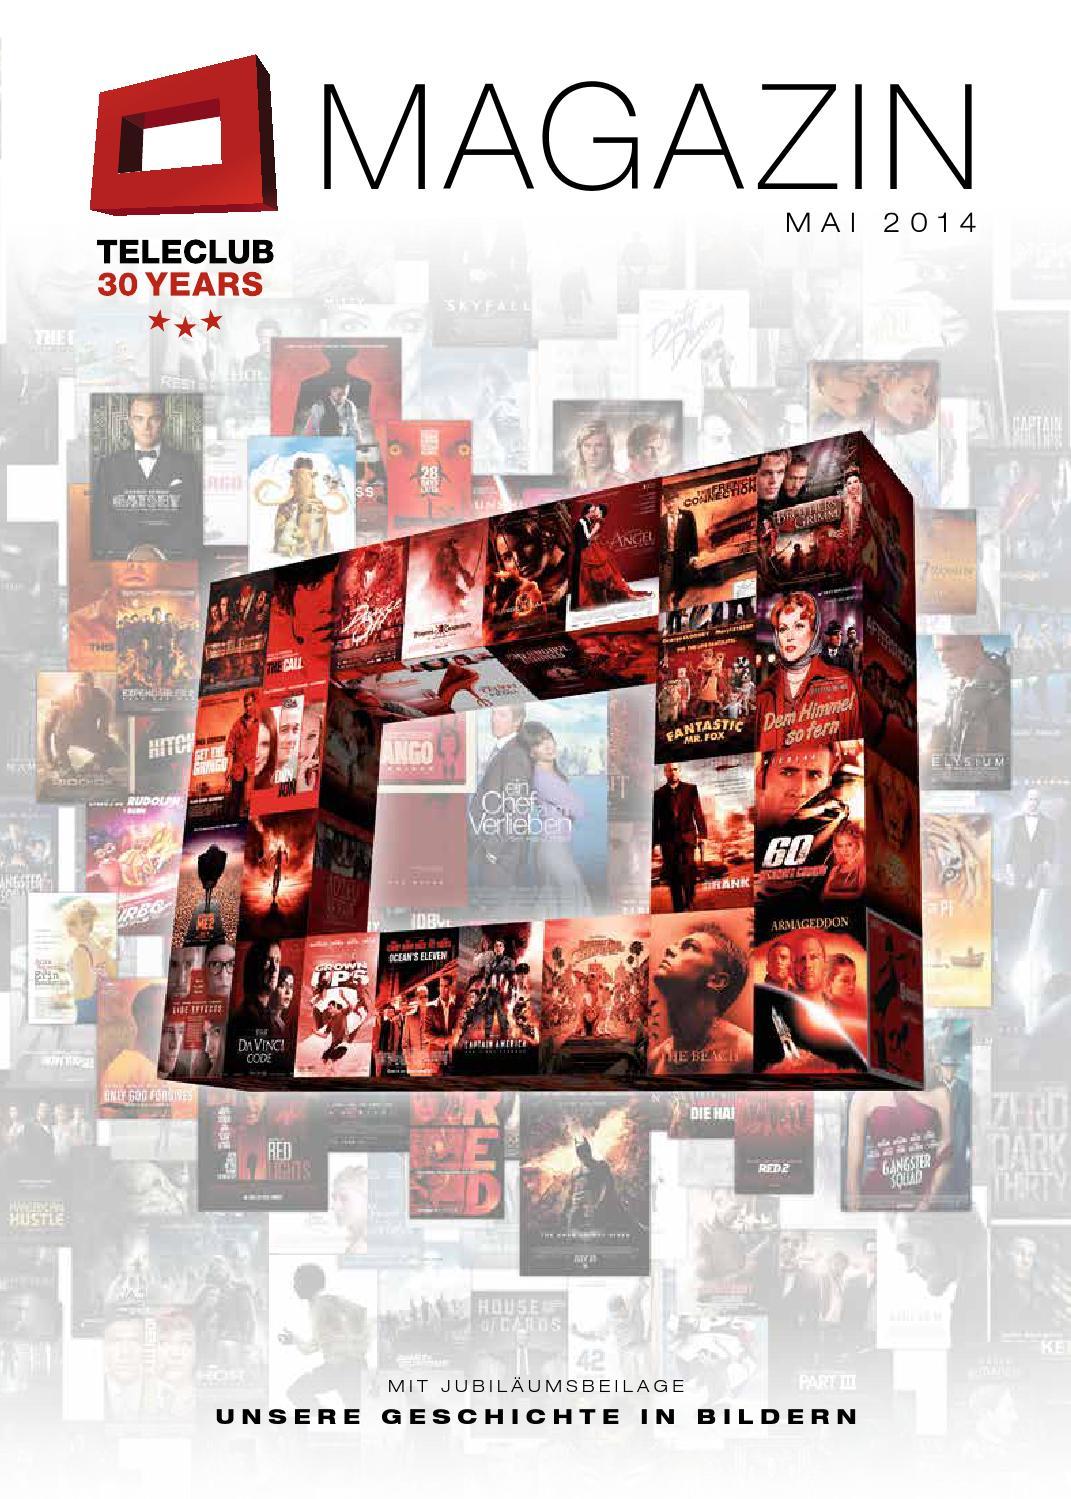 Teleclub Magazin Mai 2014 By Teleclub AG   Issuu